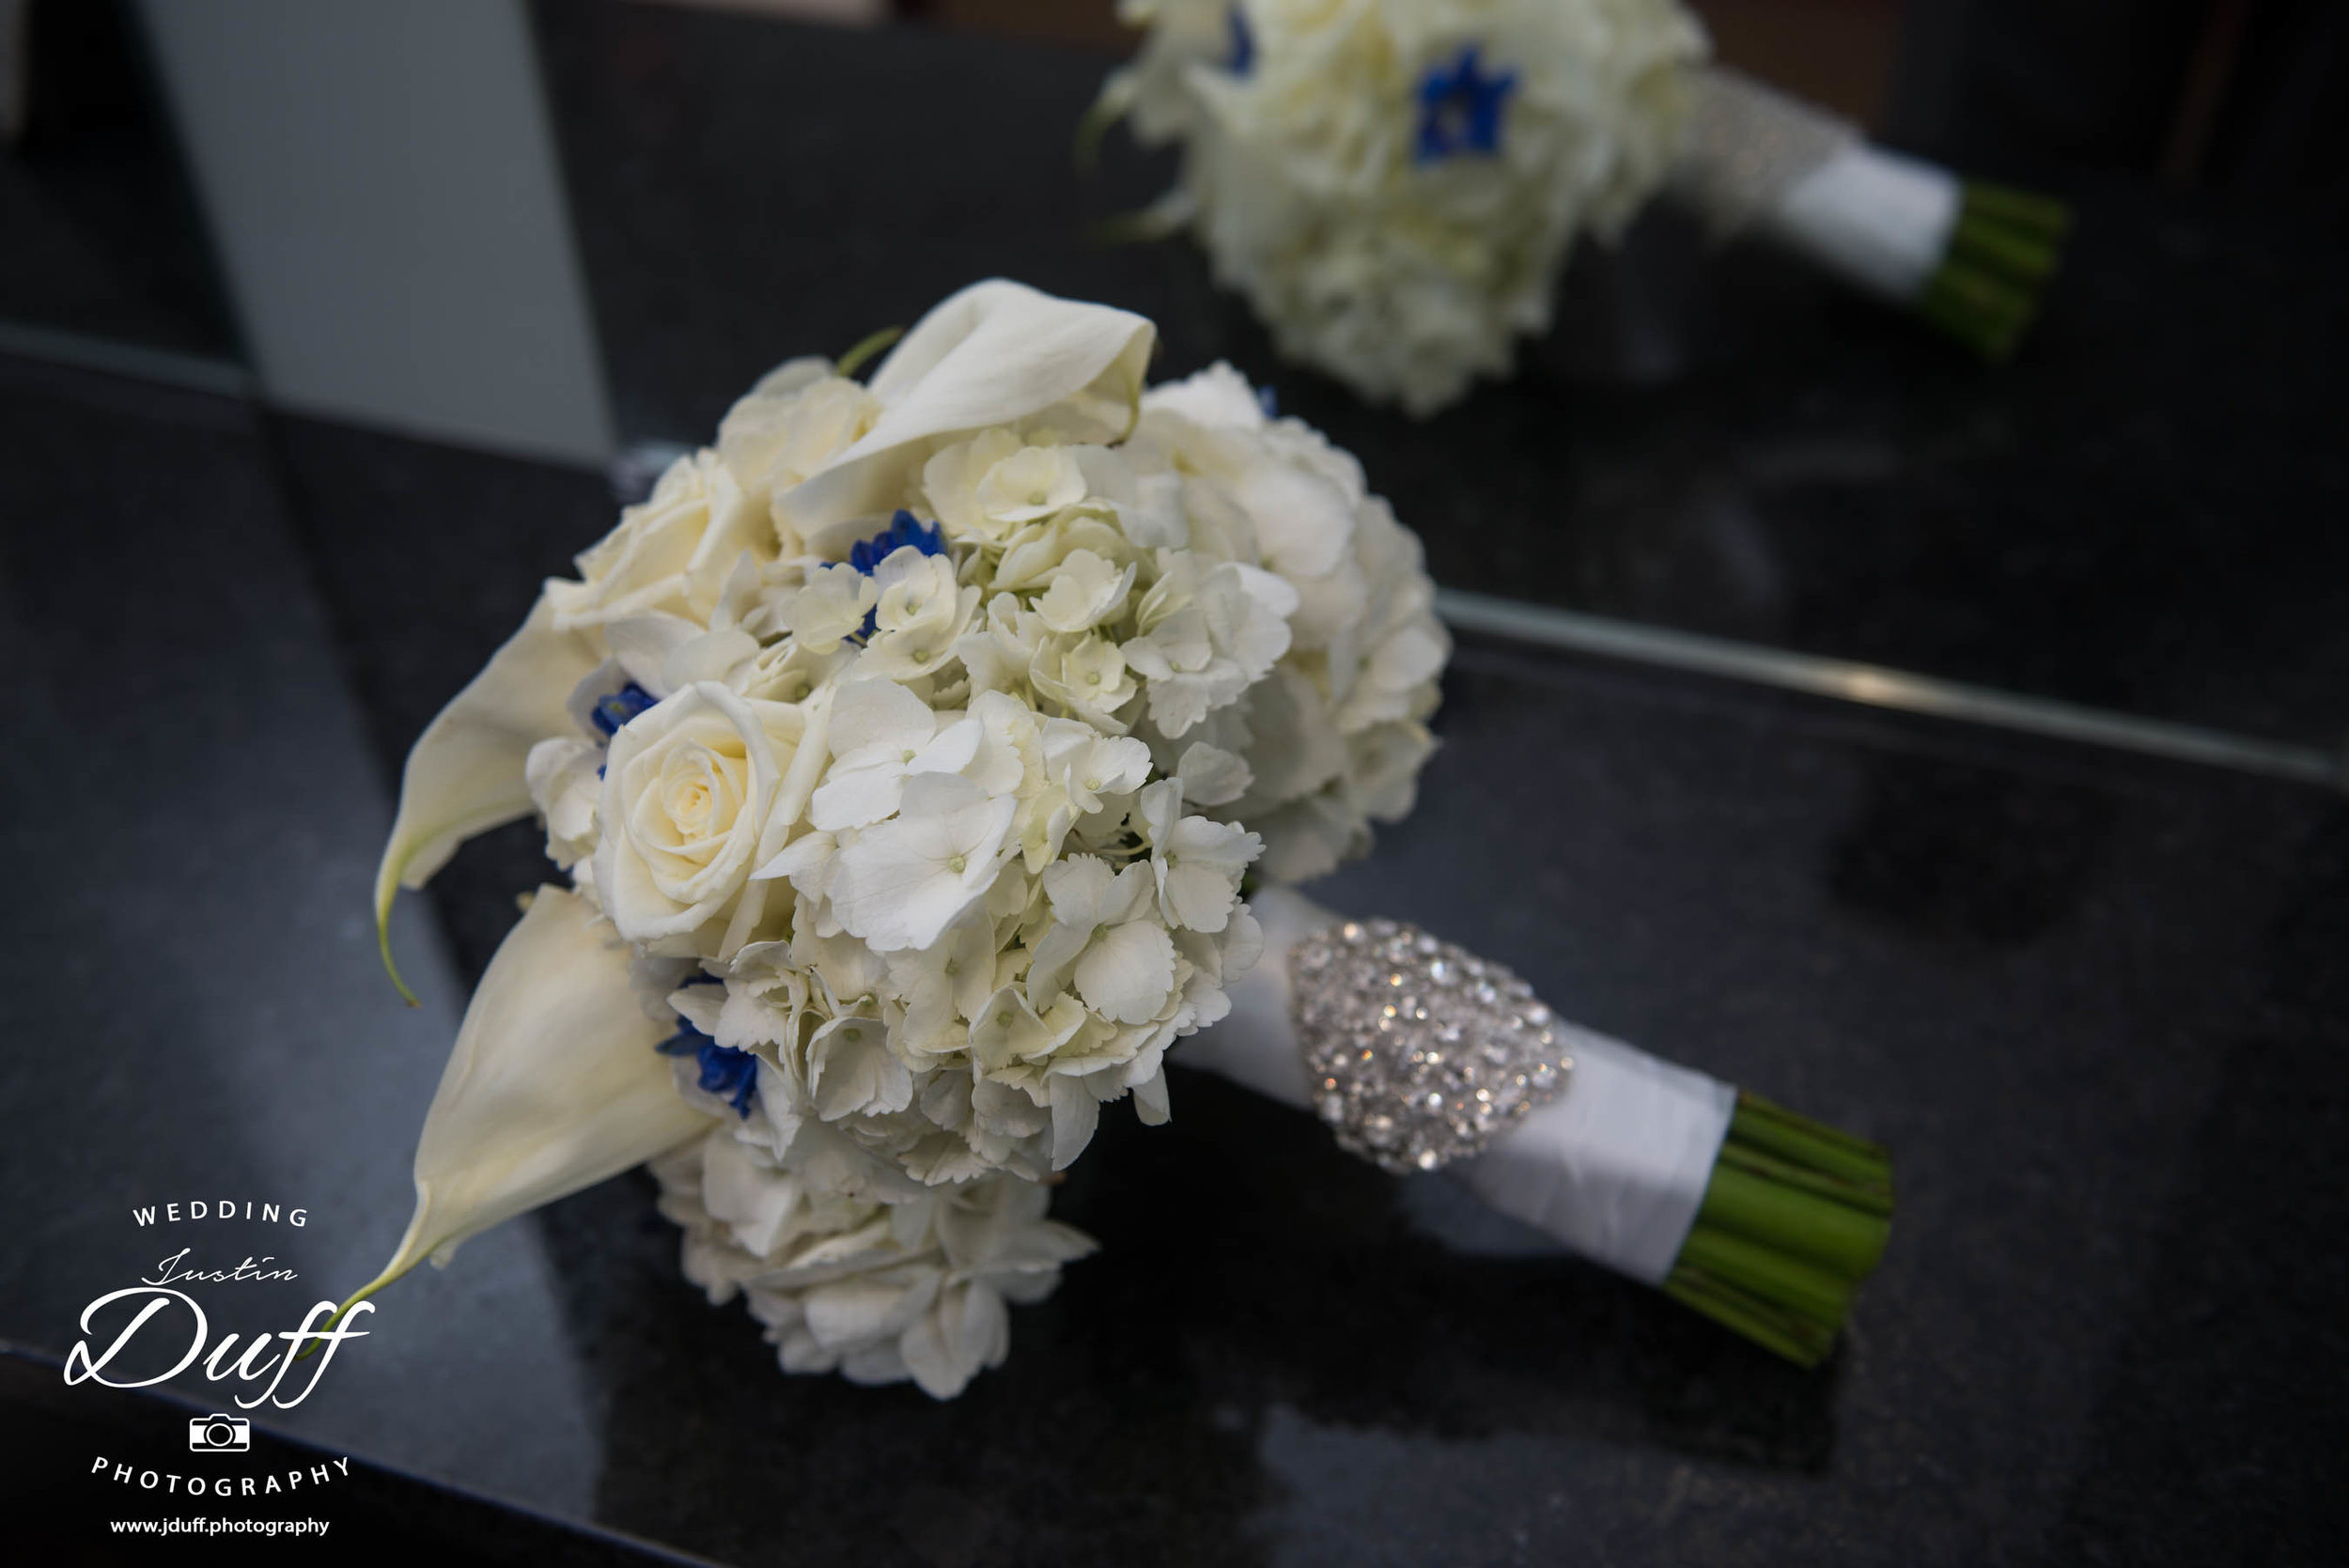 Fountains Golf Course Wedding - Royal Oak Photographer – Deanna & Shane bouquet reflecting in a mirror